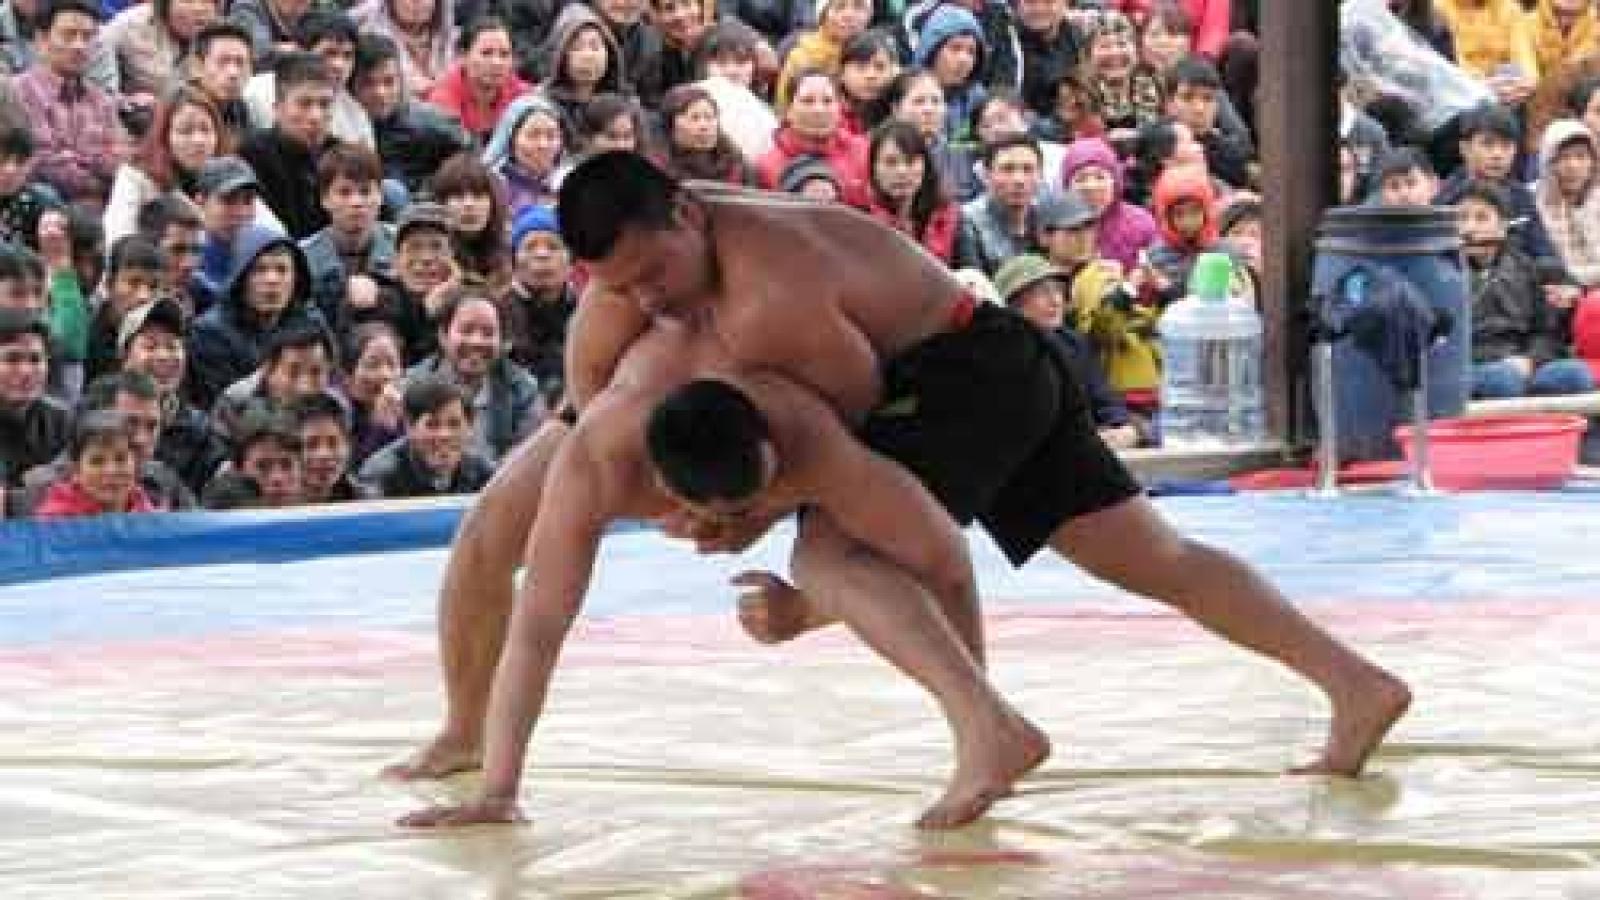 Wrestling festival draws thousands